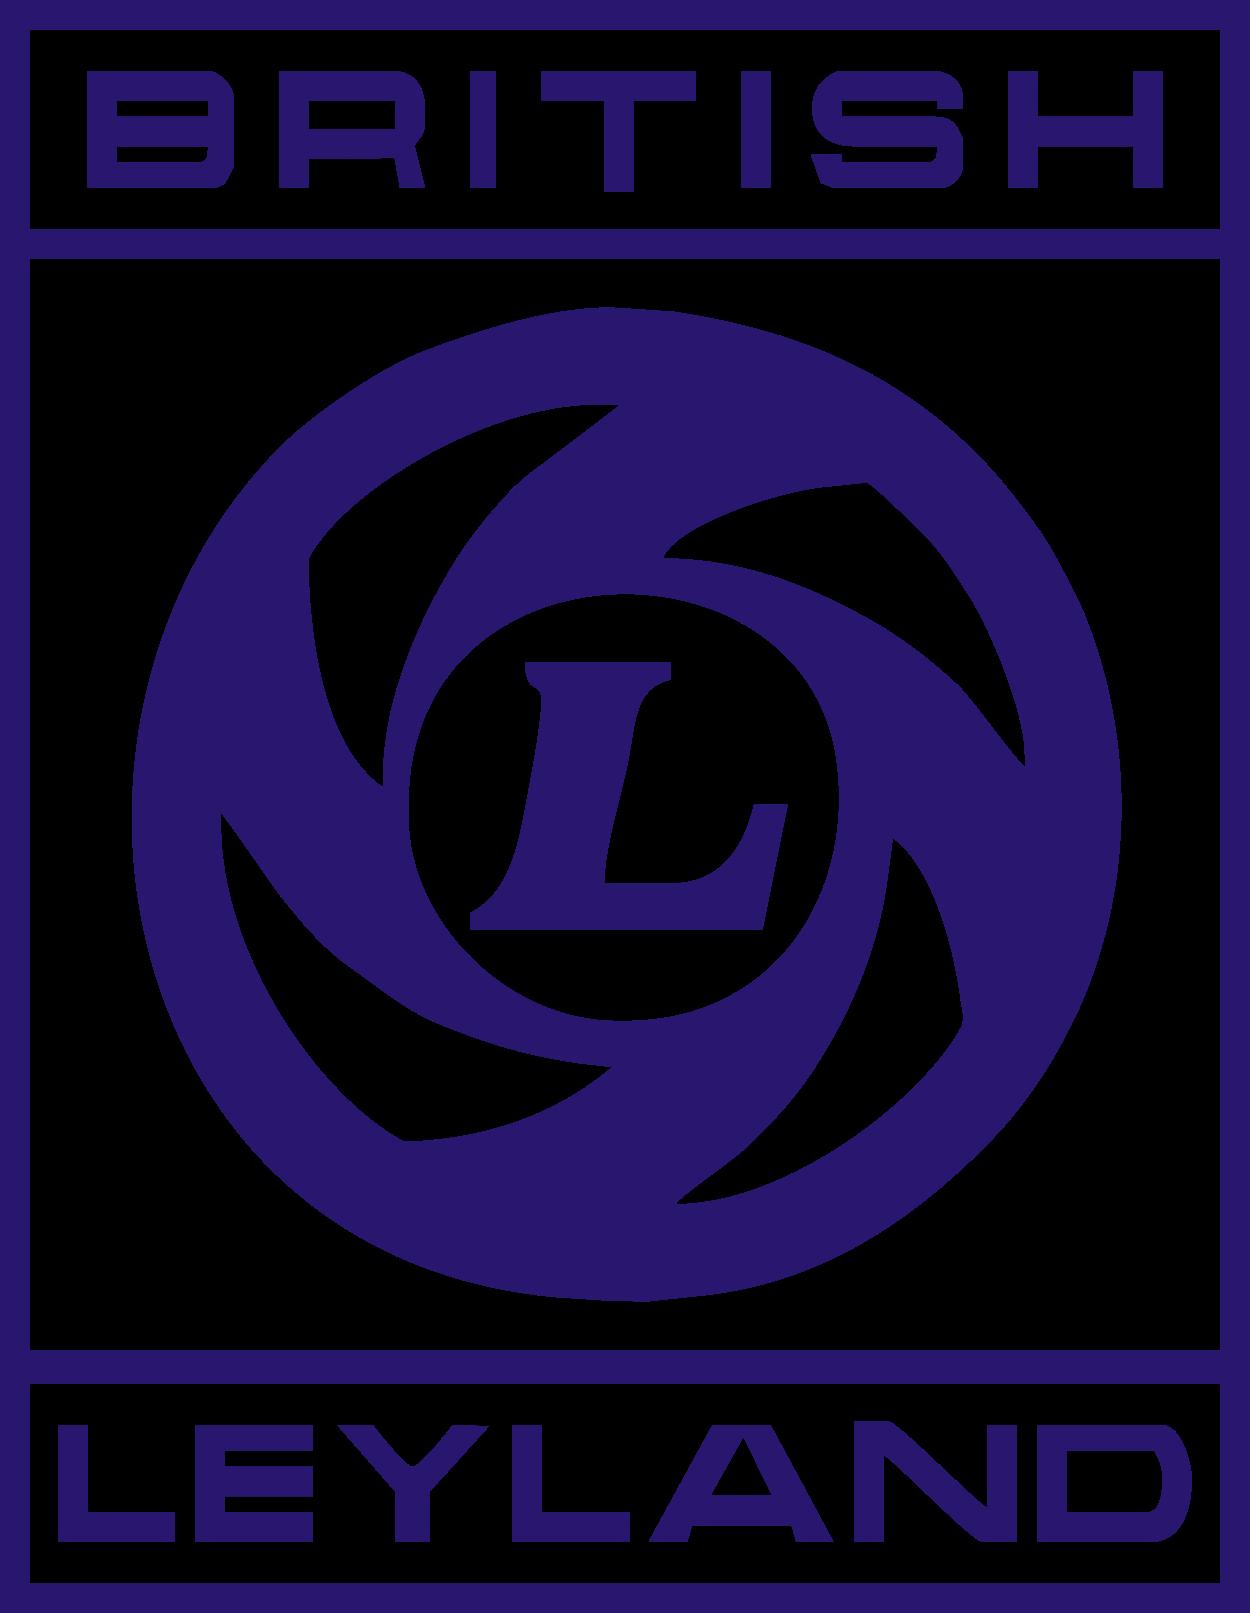 hight resolution of british leyland logo